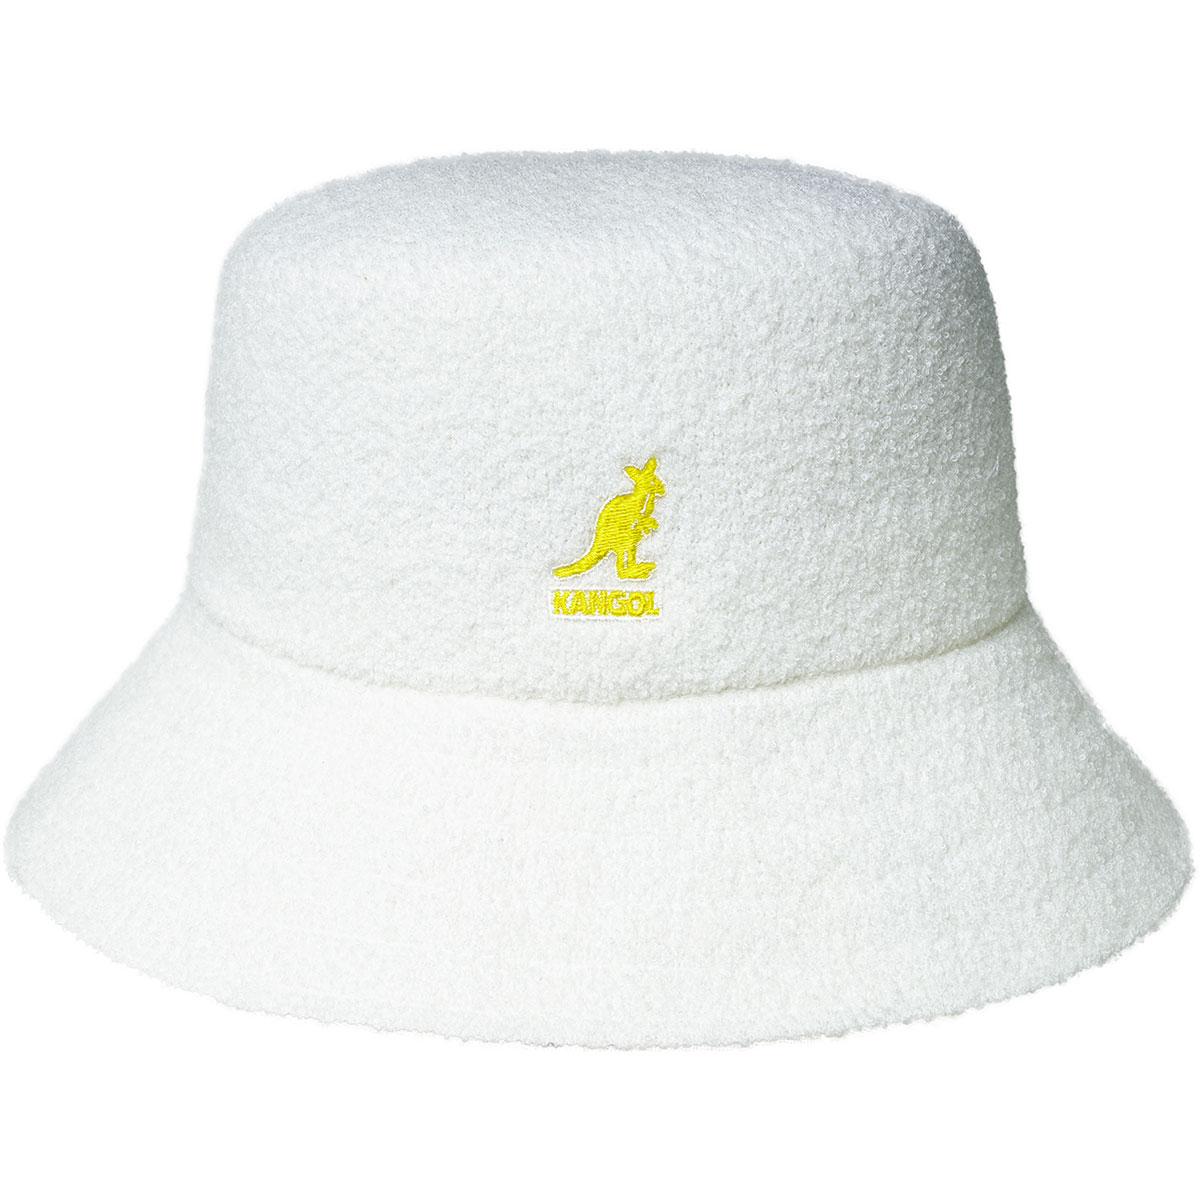 Hippie Hats,  70s Hats Limited Edition Bermuda Lahinch $70.00 AT vintagedancer.com